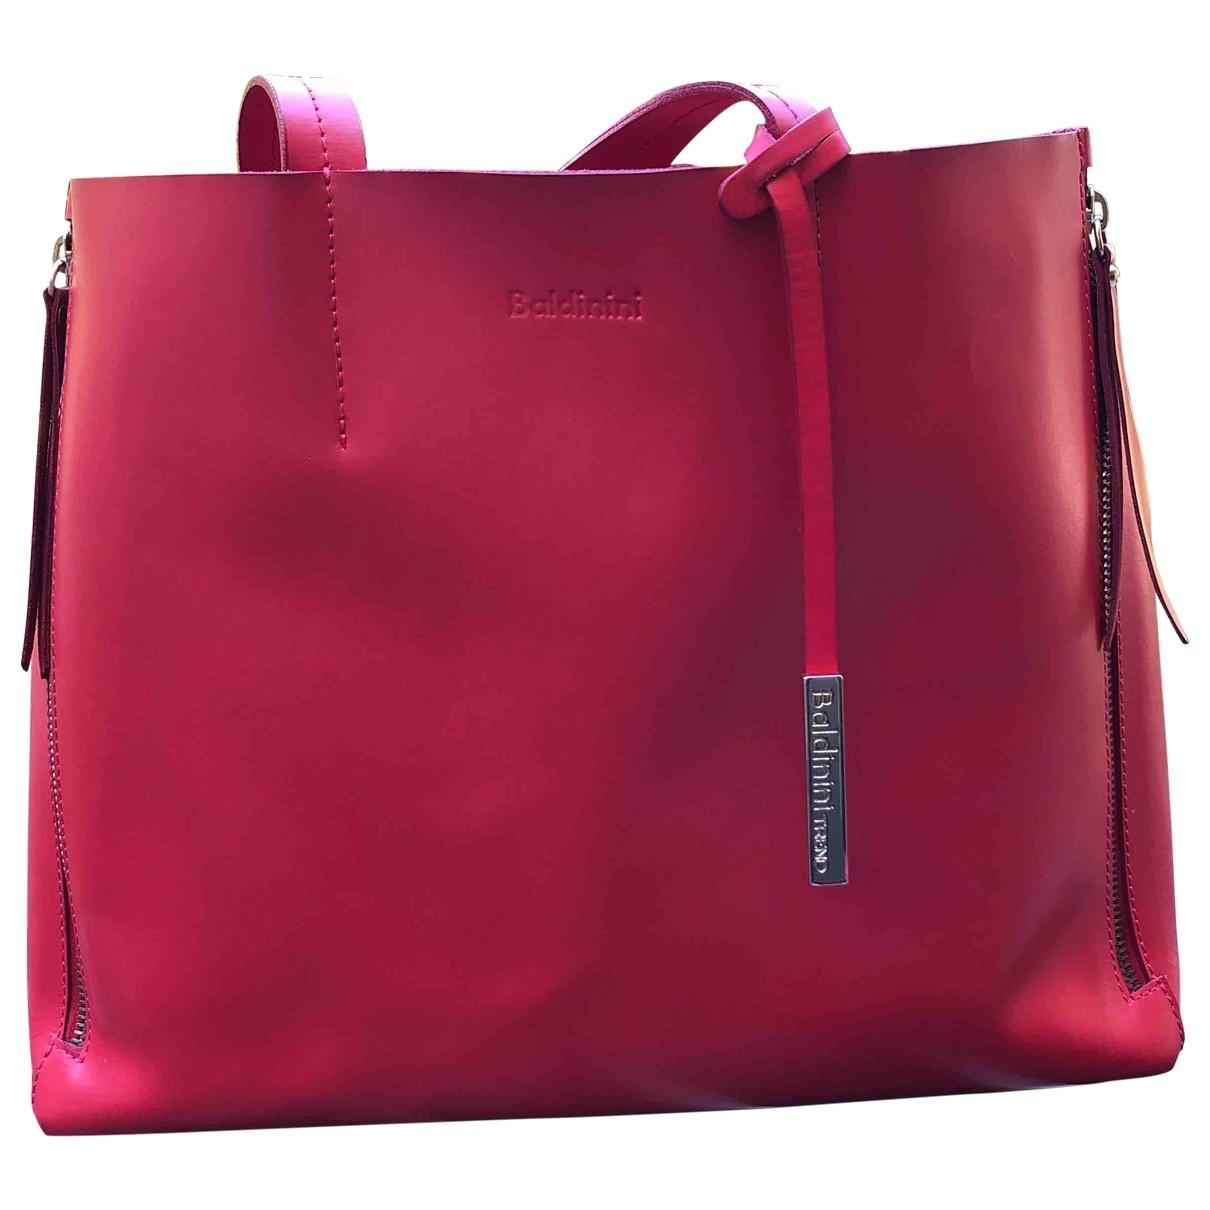 Baldinini \N Red Leather handbag for Women \N